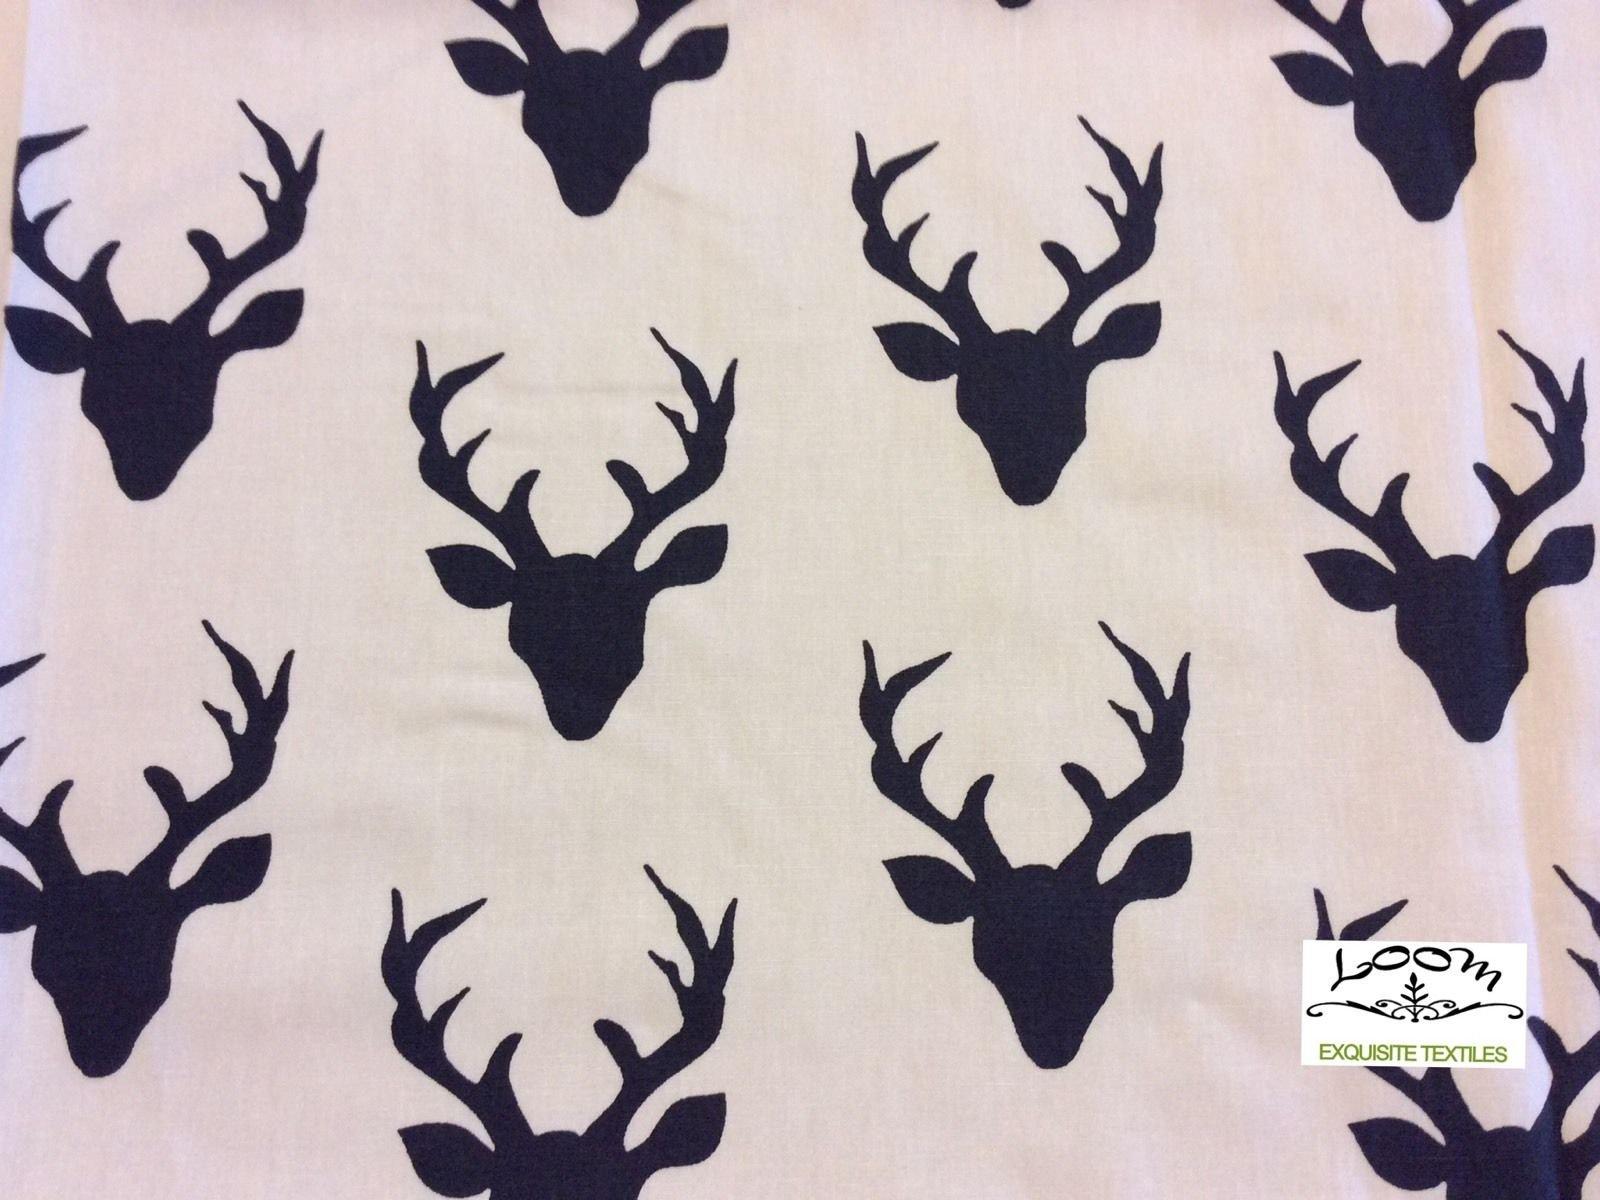 Hello Bear Deer Antler Silhouette Scandinavian Retro Cotton Quilting Fabric AR05